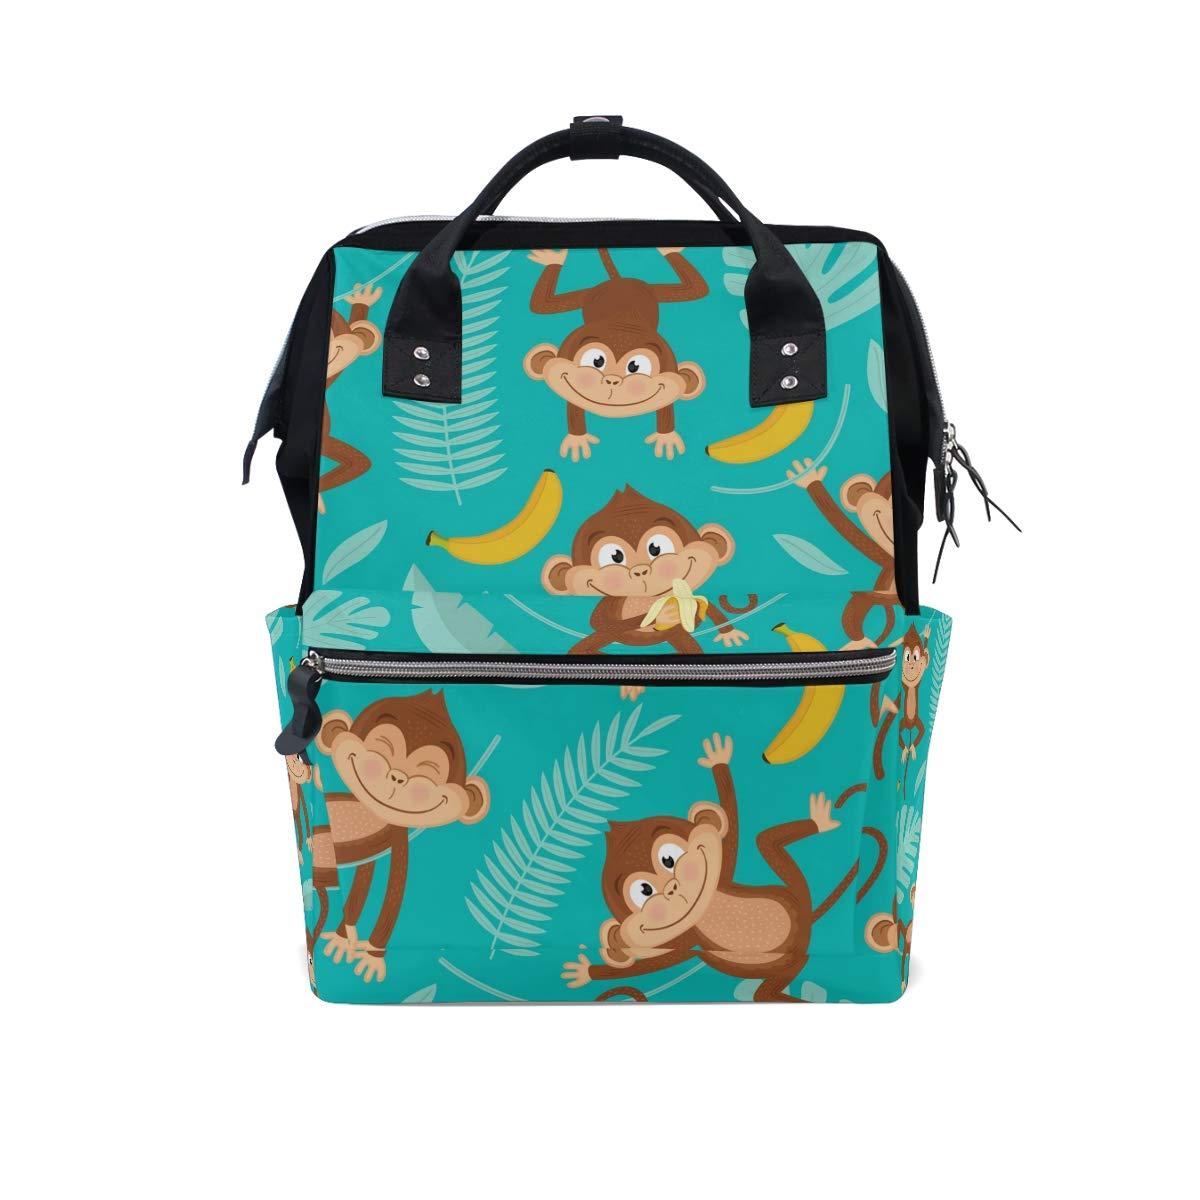 MERRYSUGAR Diaper Bag Backpack Cute Monkey Banana Green Multifunction Travel Bag